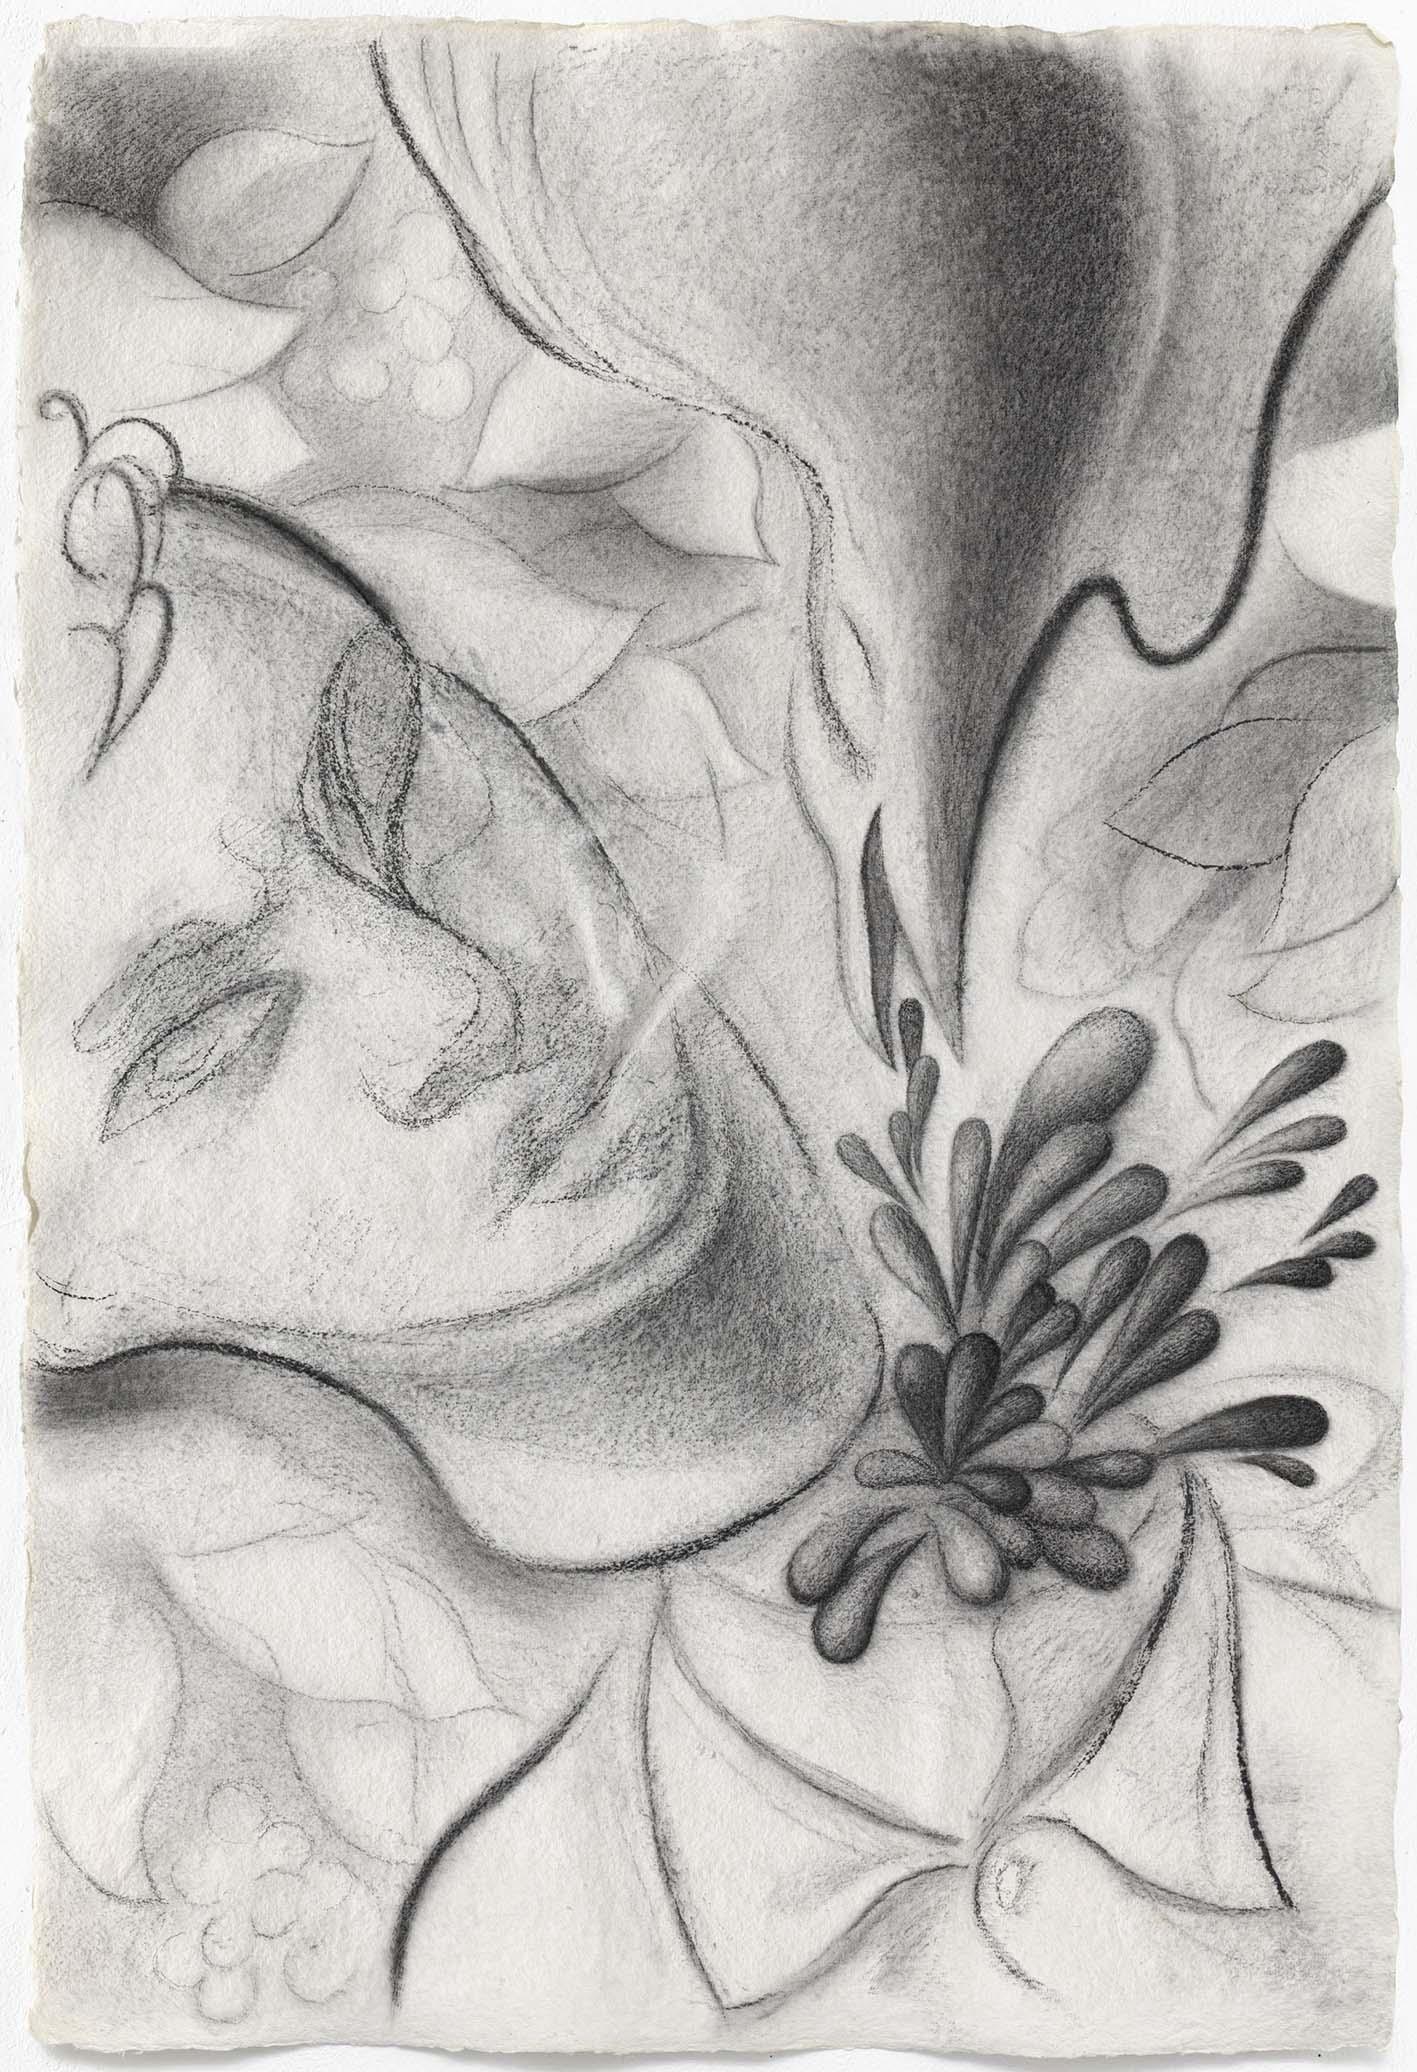 Dennis Scholl Bark Berlin Charcoal Drawing